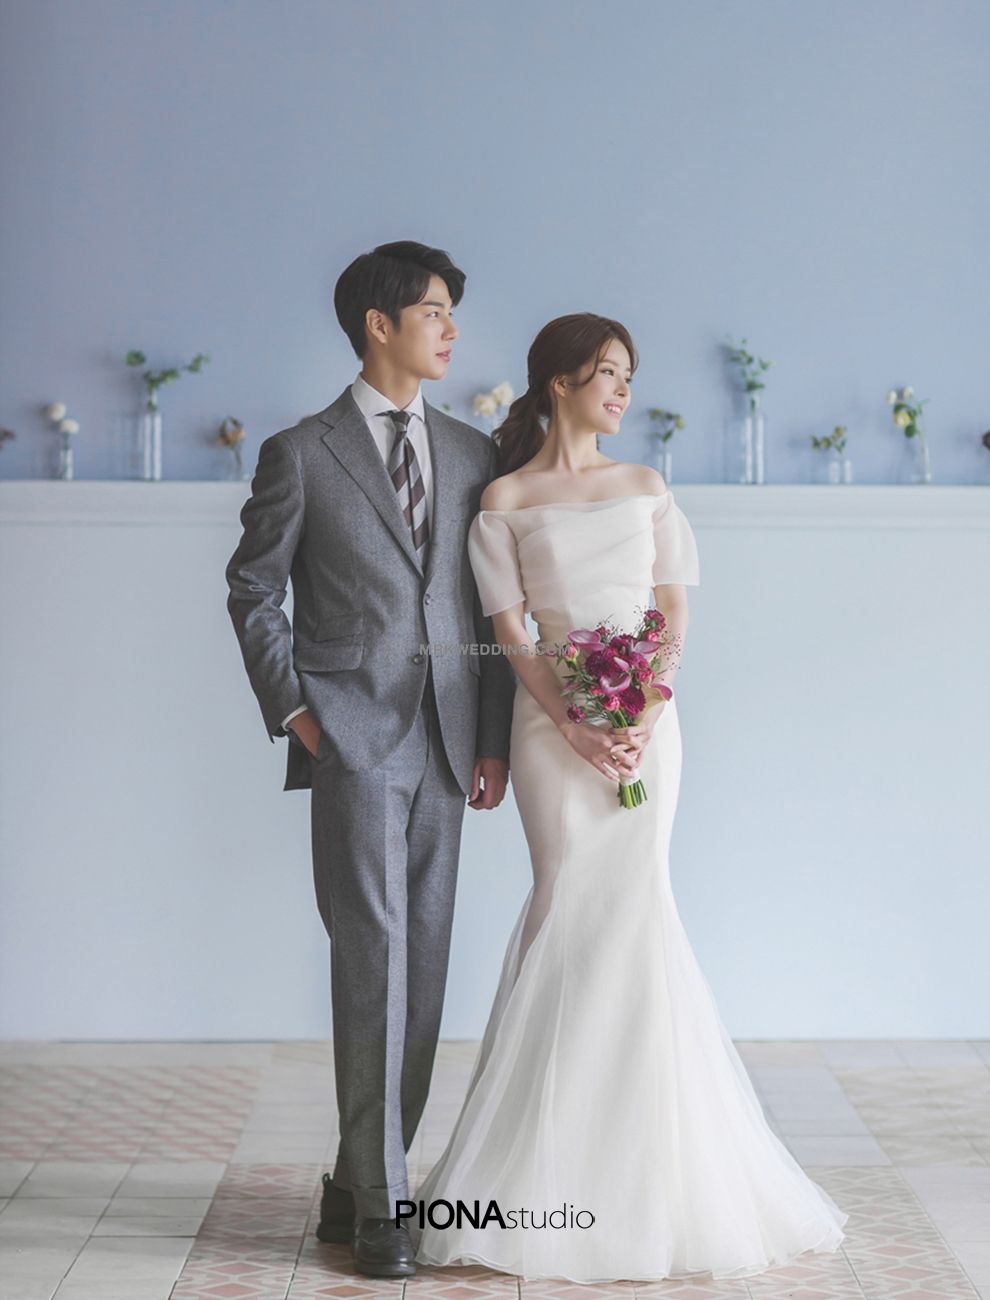 Piona Studio 2018 New Sample Media Vale Wedding Package Mr K Korea Pre Wedding Everyday Something Ne Pre Wedding Photoshoot Wedding Photoshoot Wedding